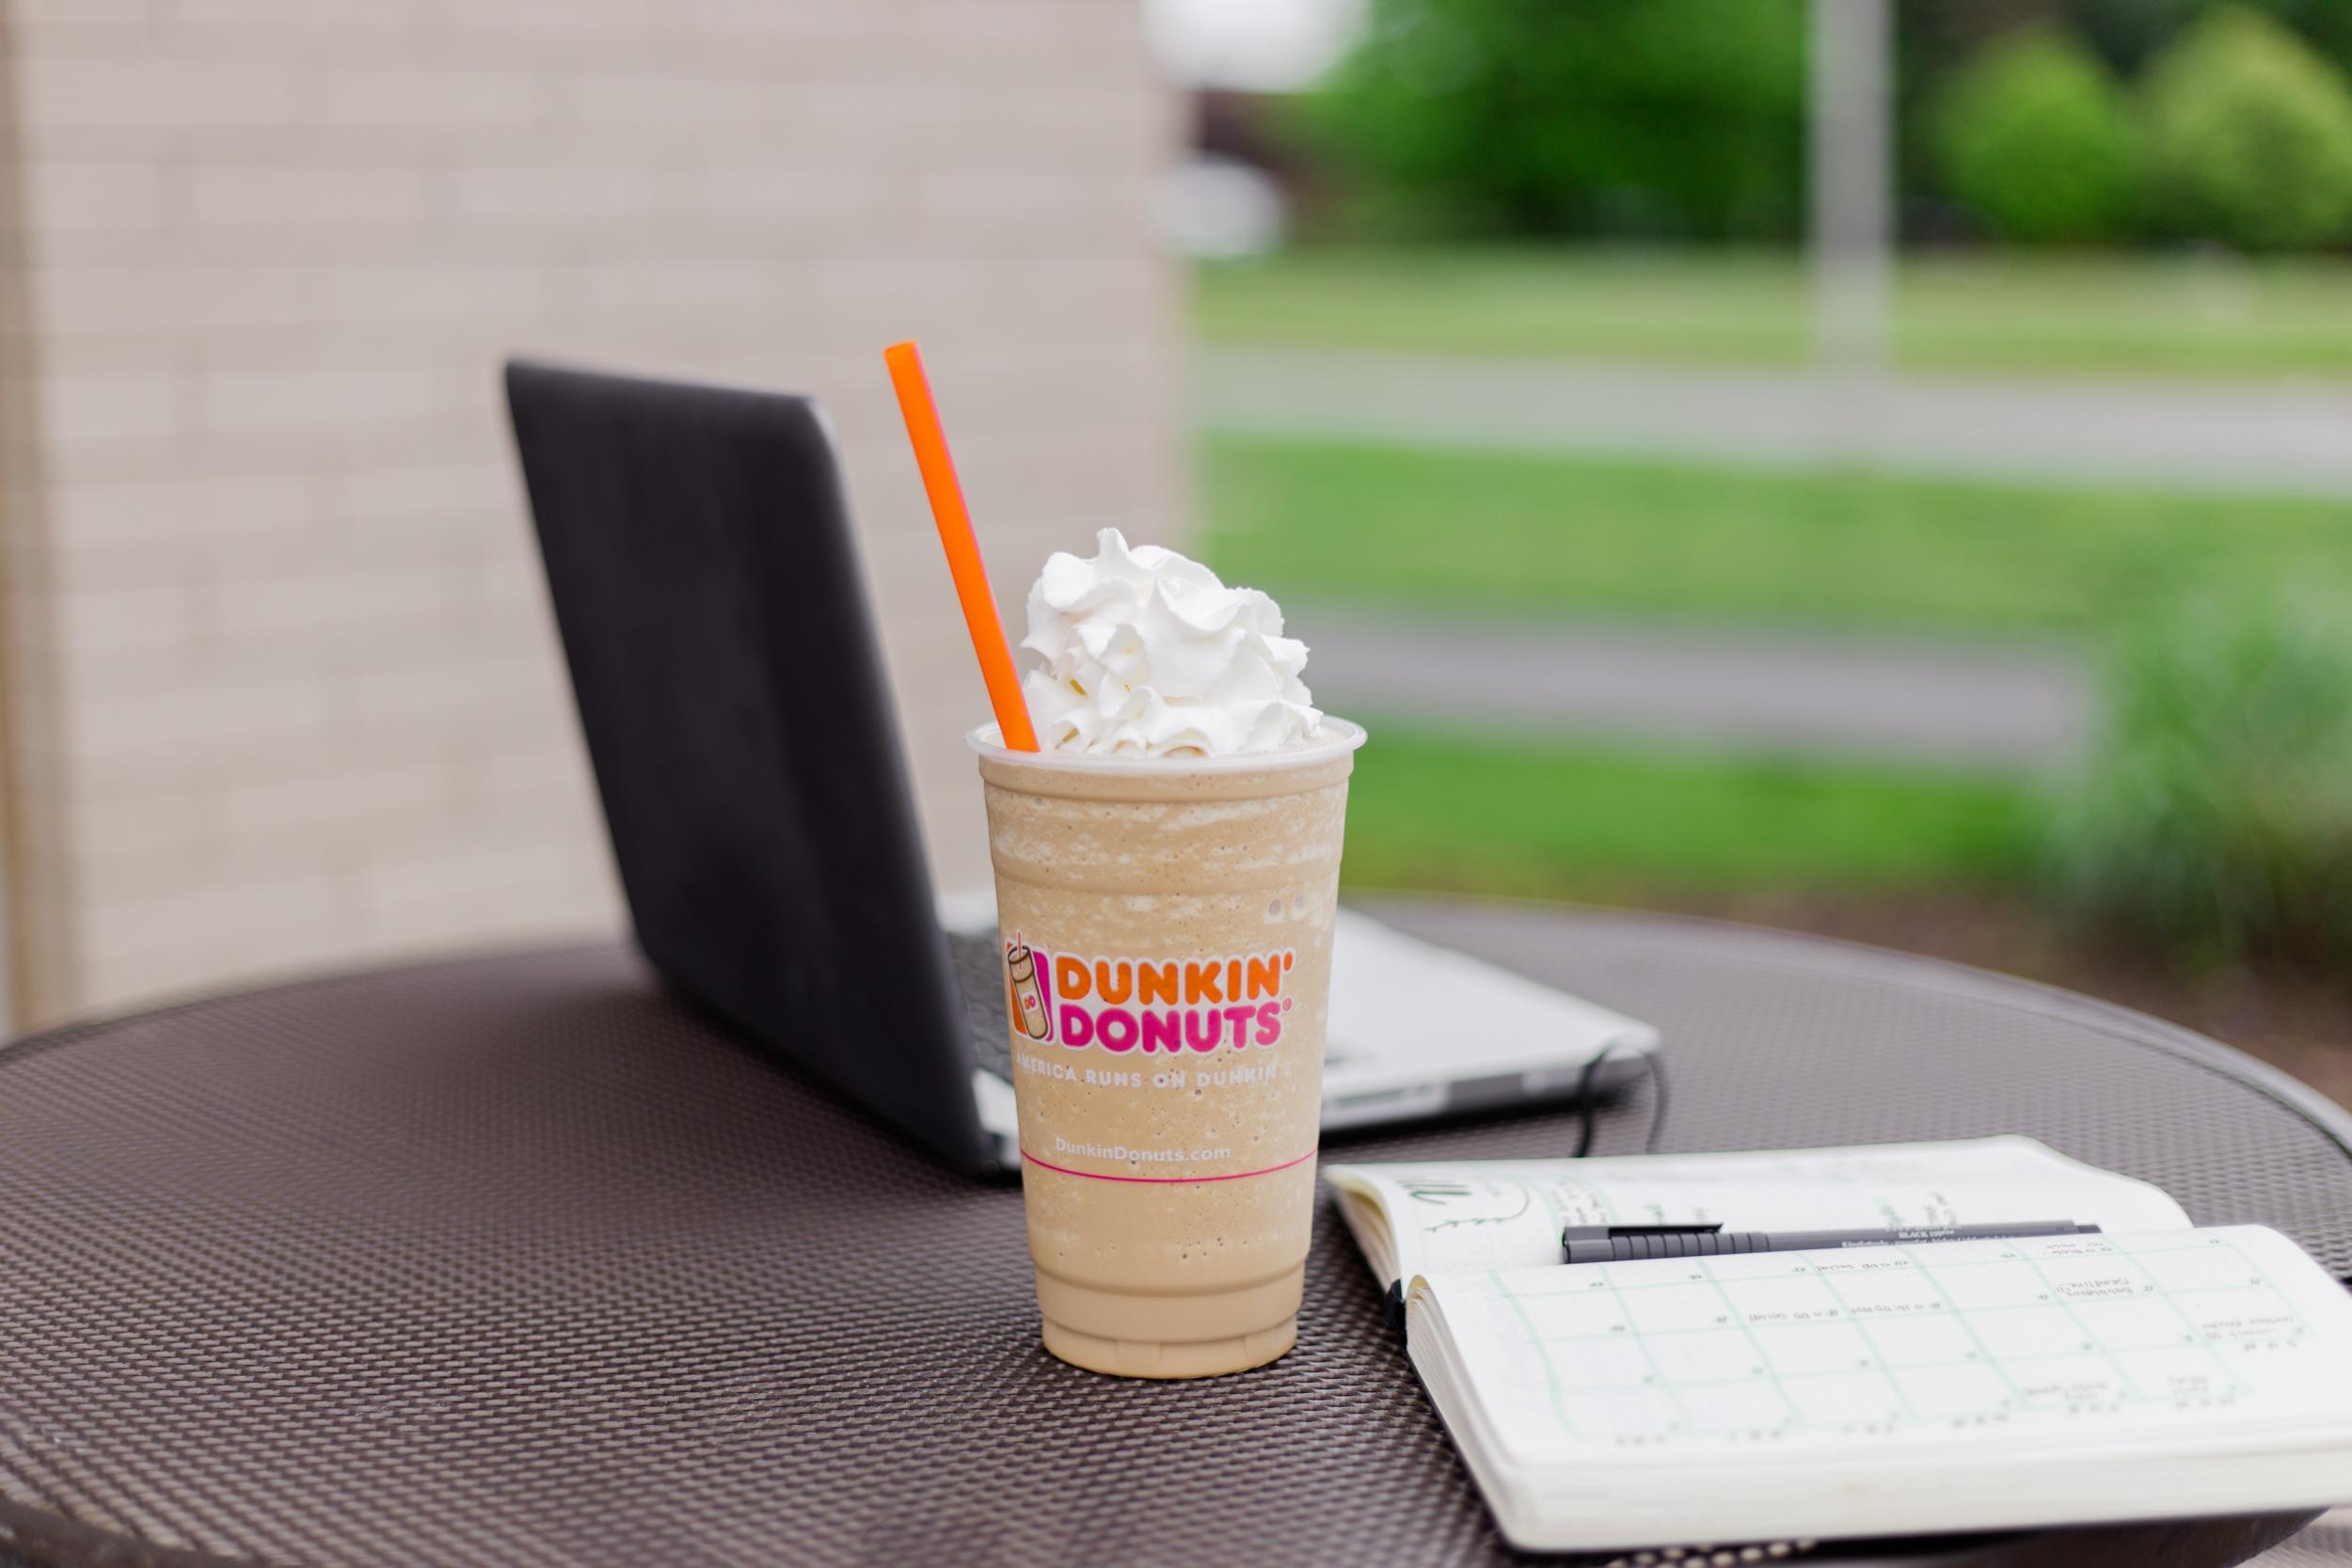 frozen creamy goodness -